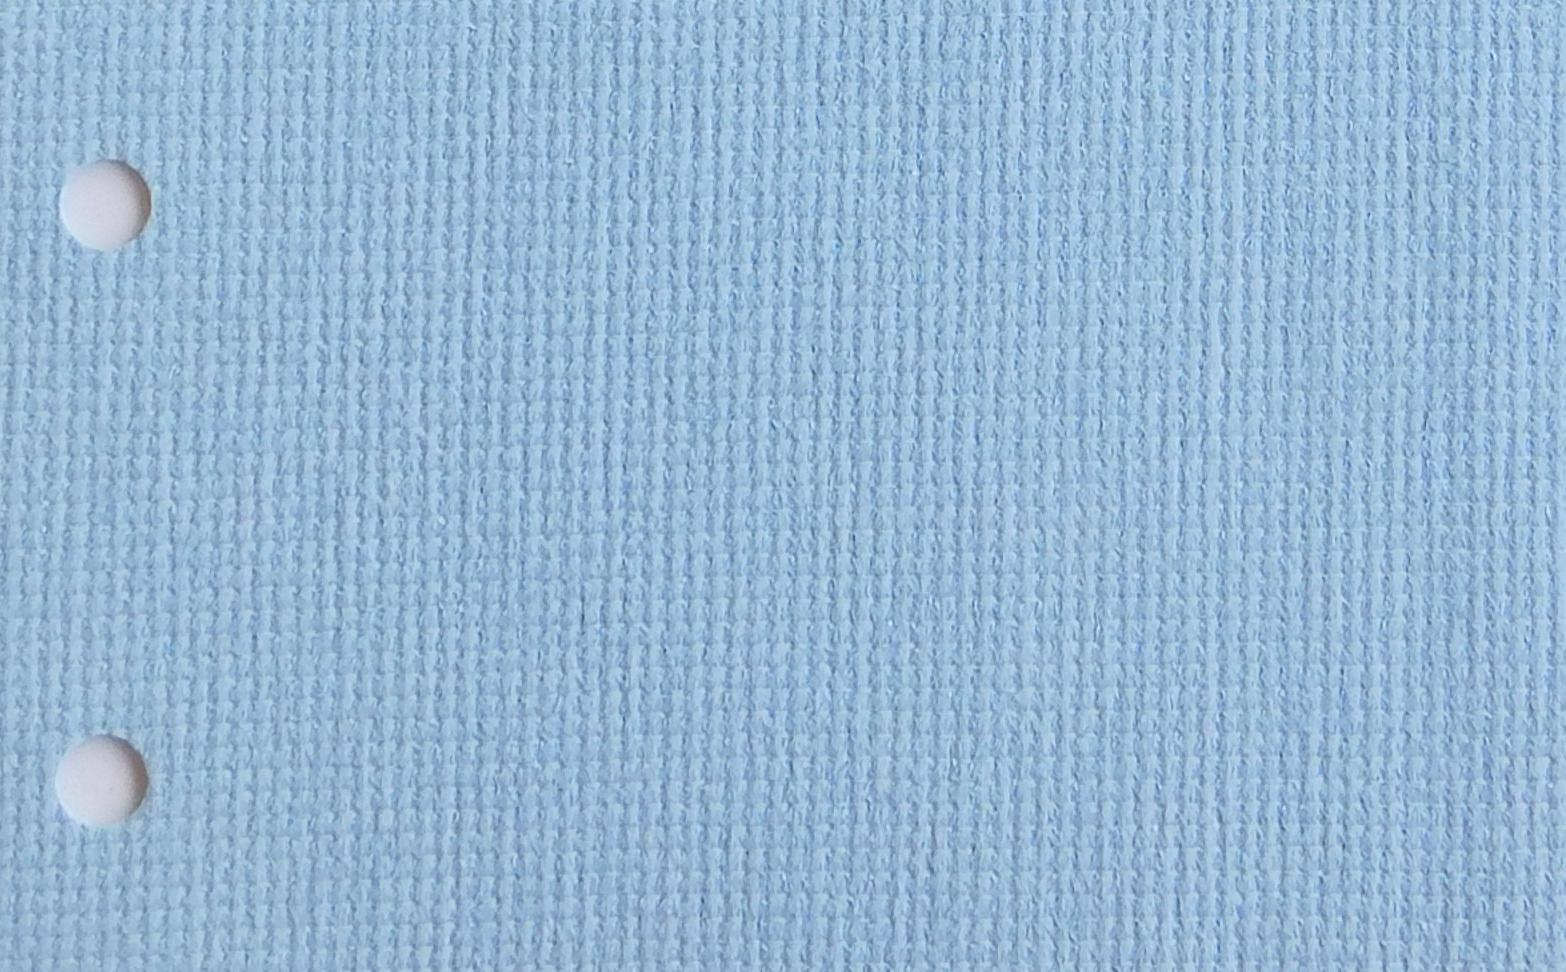 Guardian Pale Blue Blind fabric